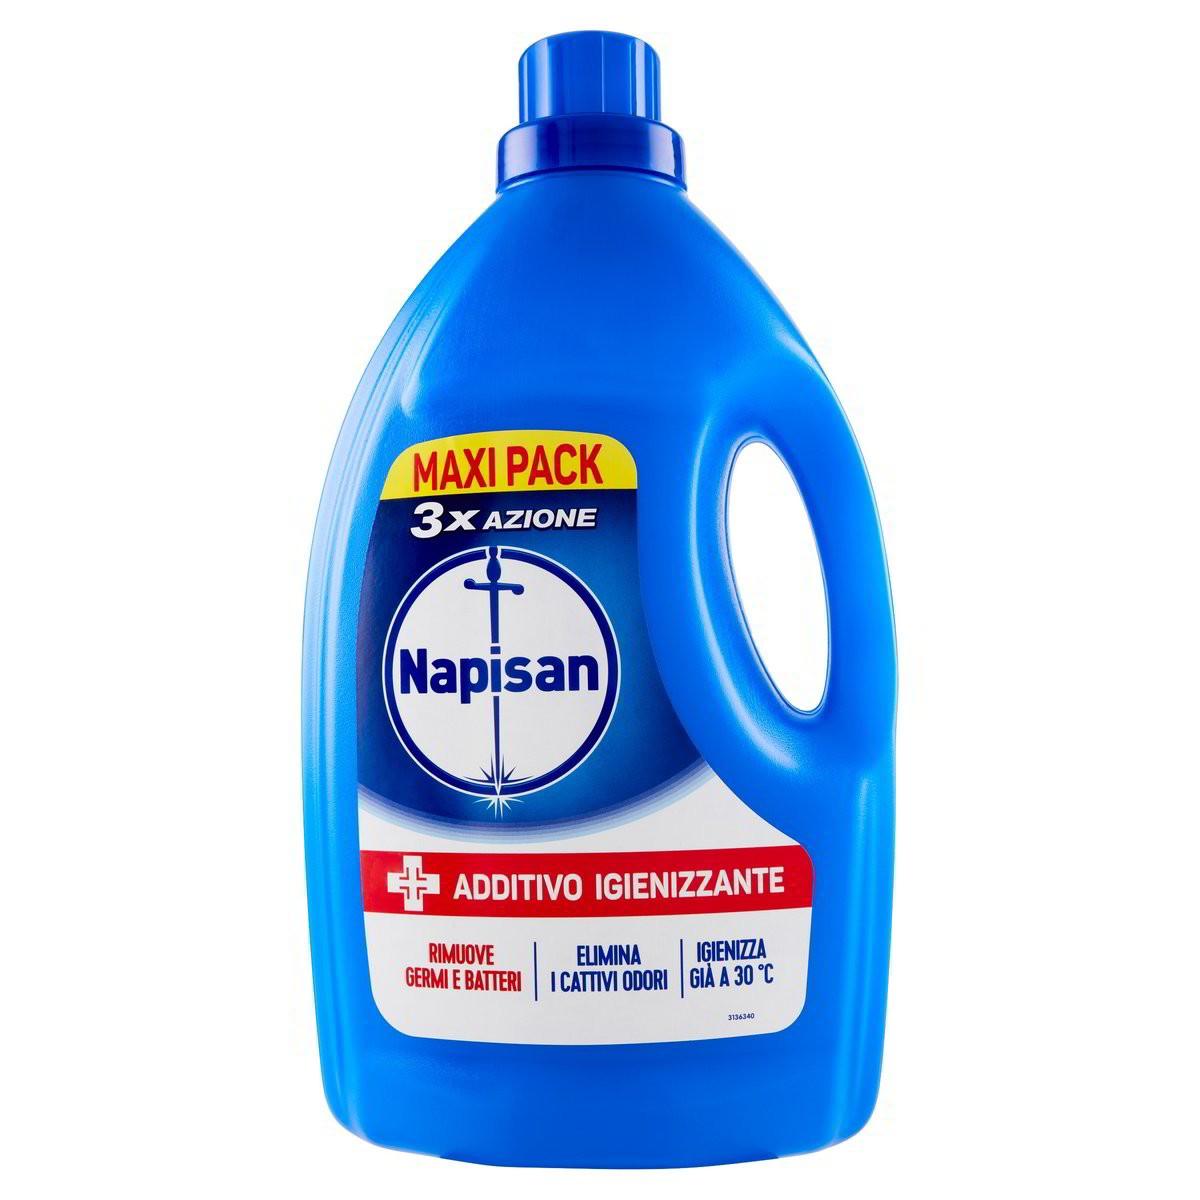 NAPISAN Detersivo Liquido Lavatrice Igienizzante